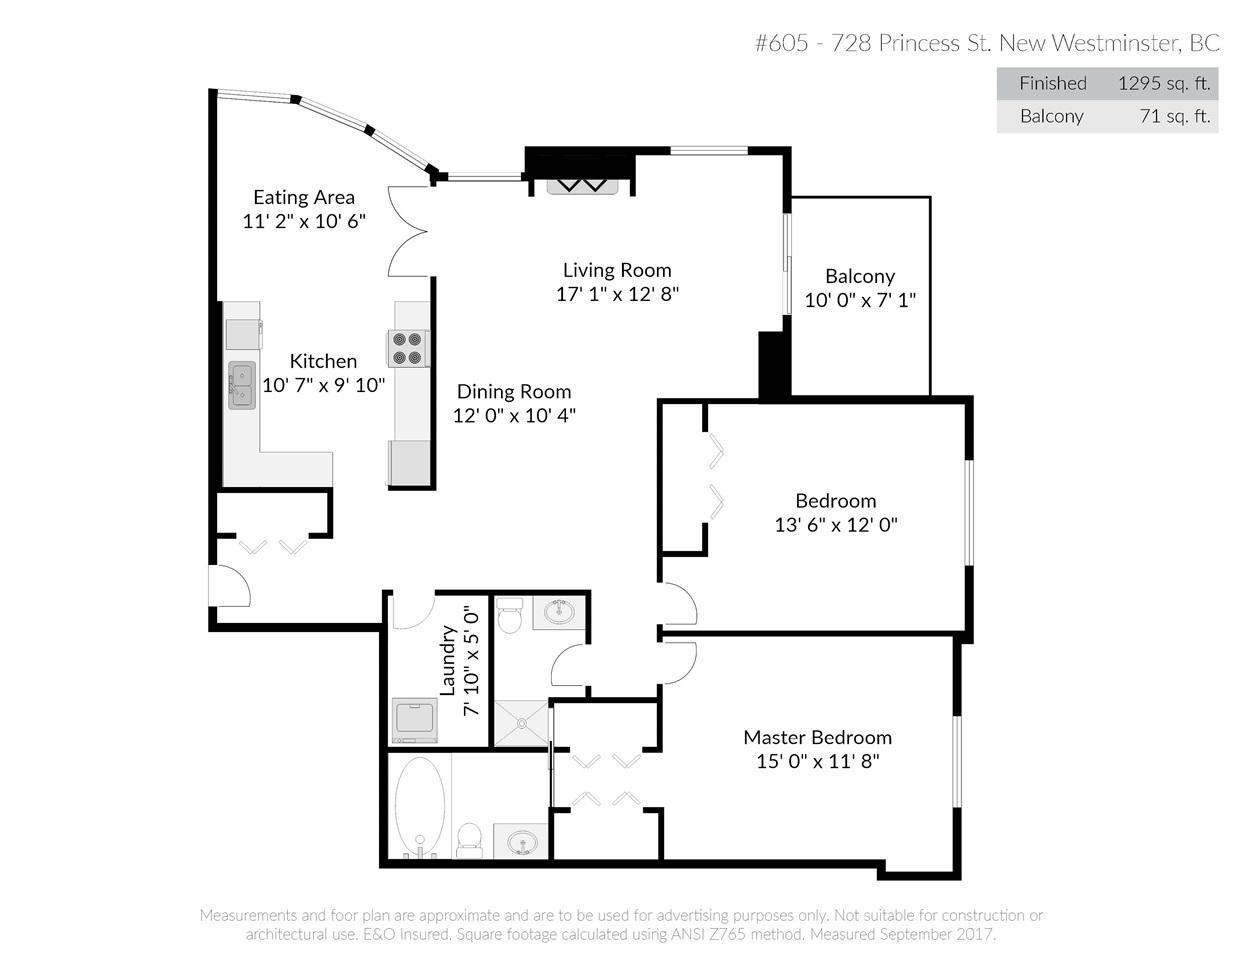 Condo Apartment at 605 728 PRINCESS STREET, Unit 605, New Westminster, British Columbia. Image 2